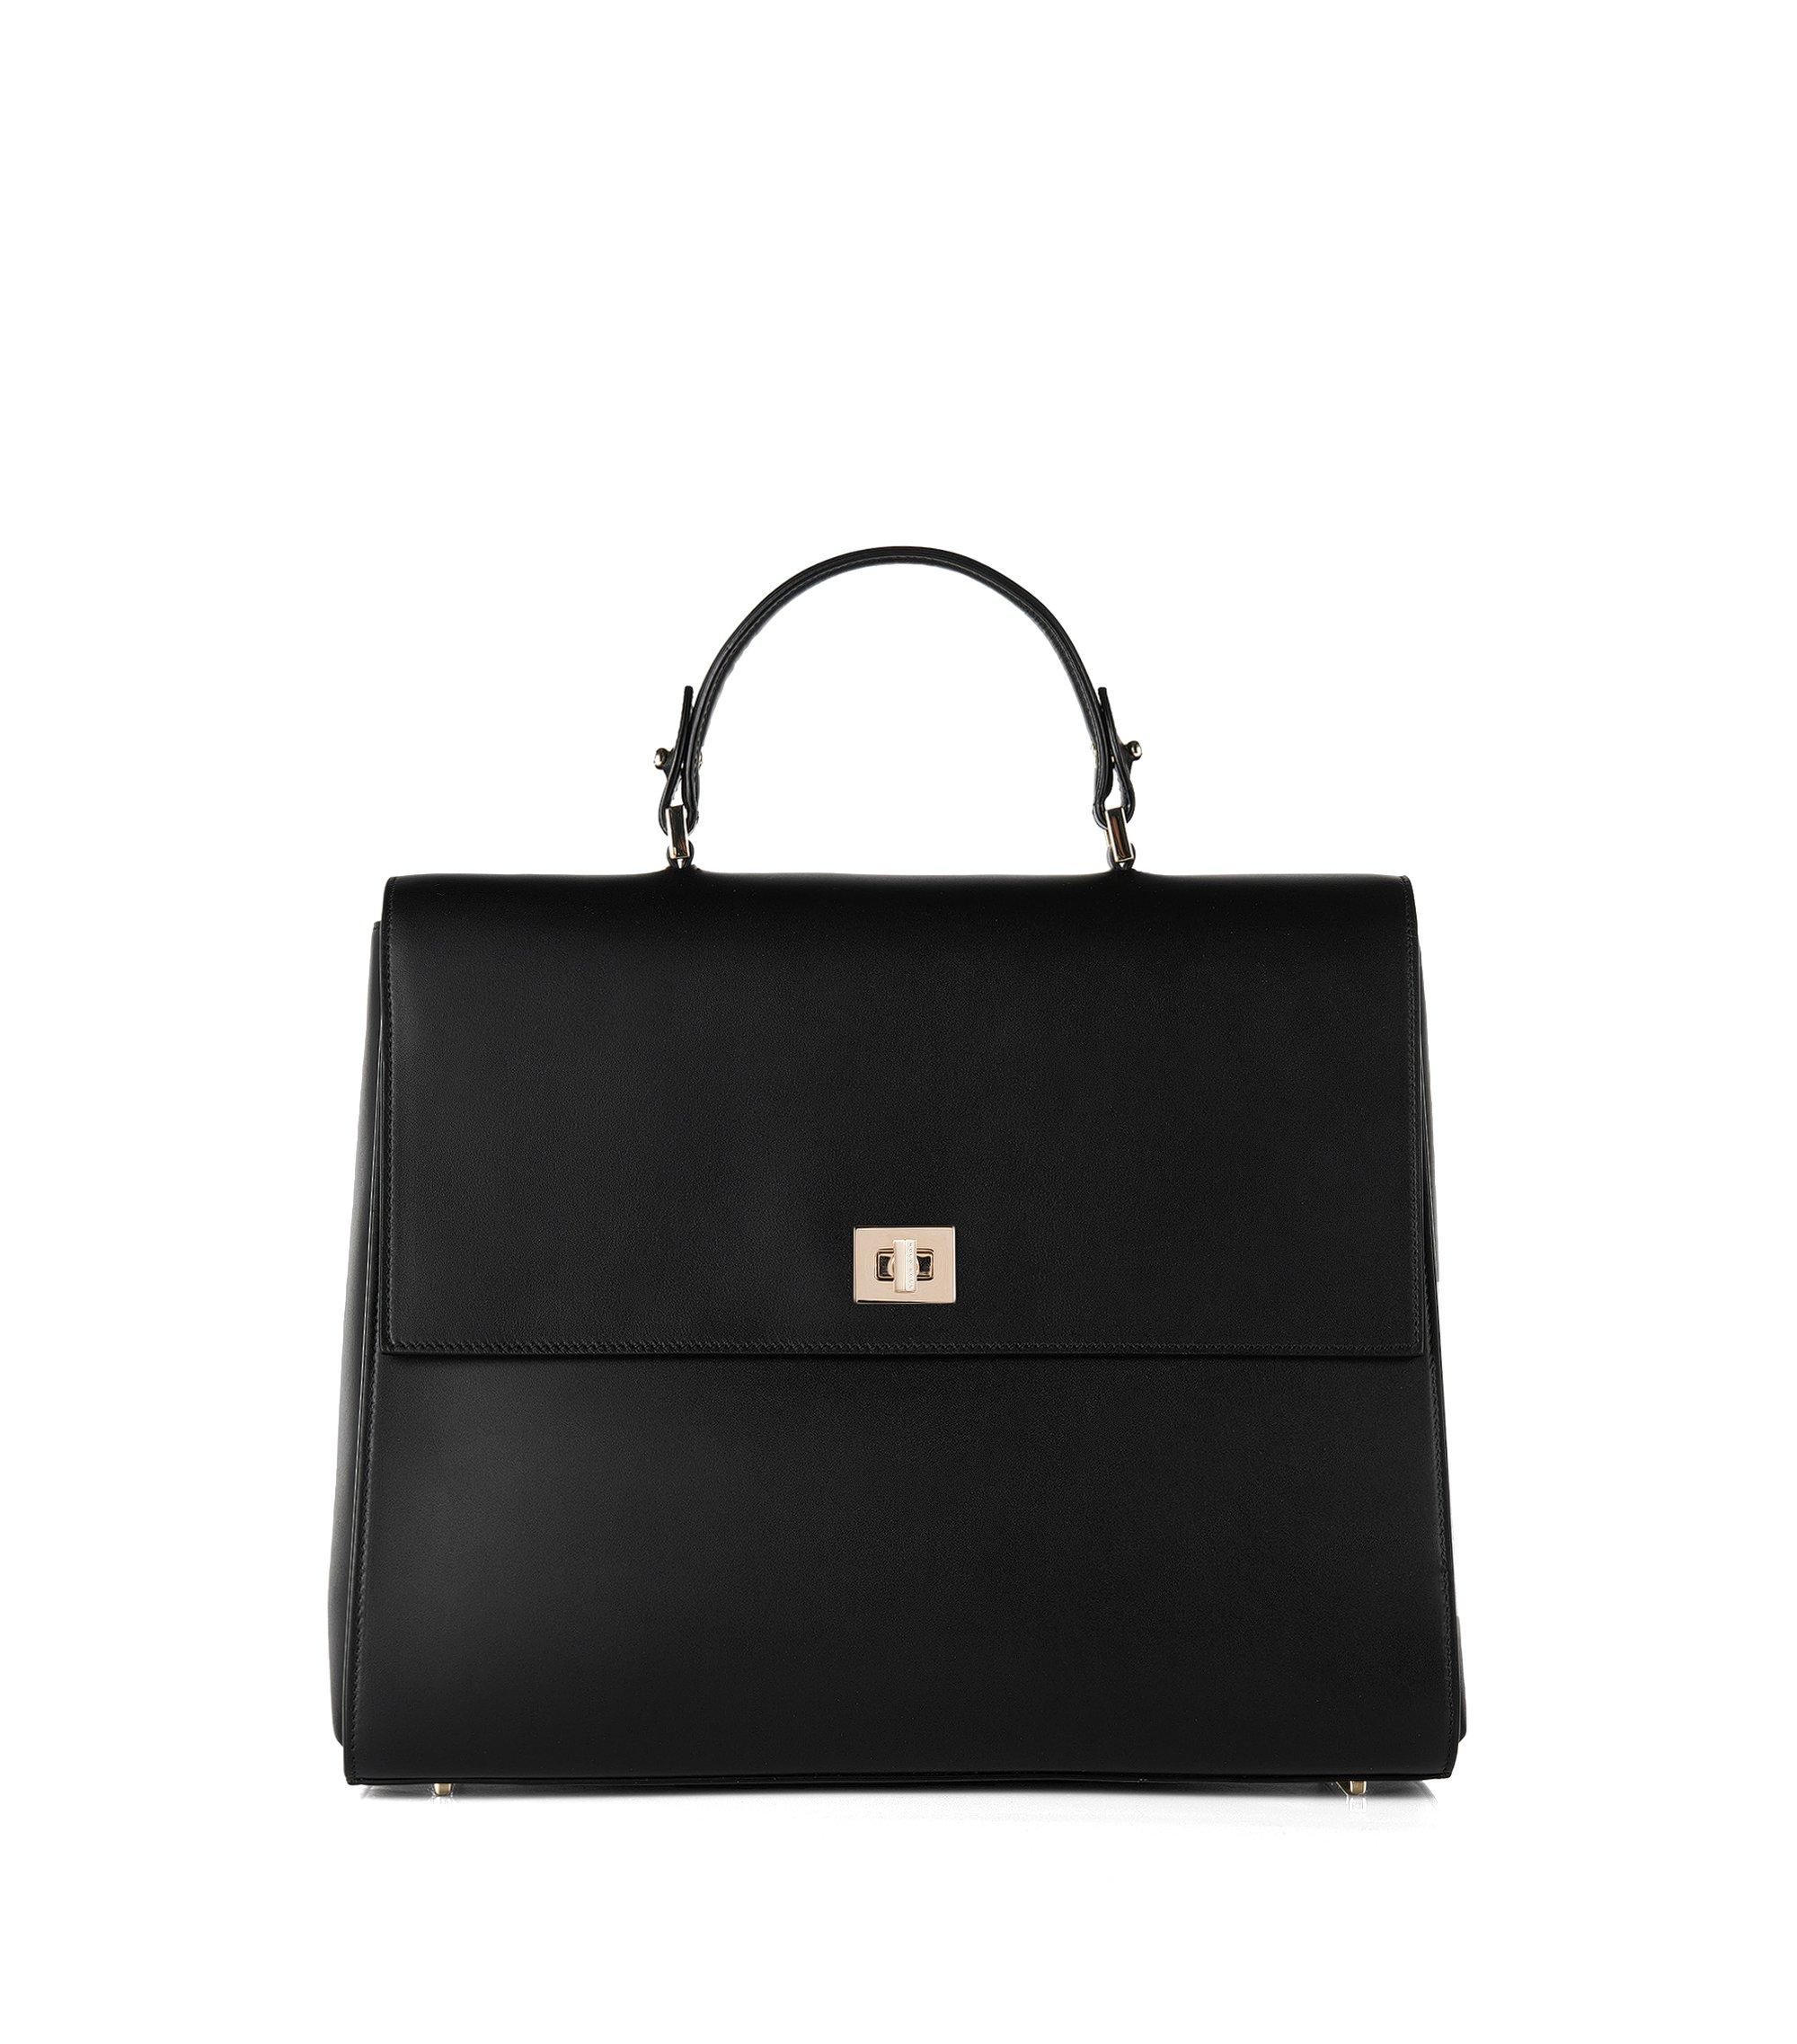 'Bespoke' | Leather Handbag, Detachable Strap, Black